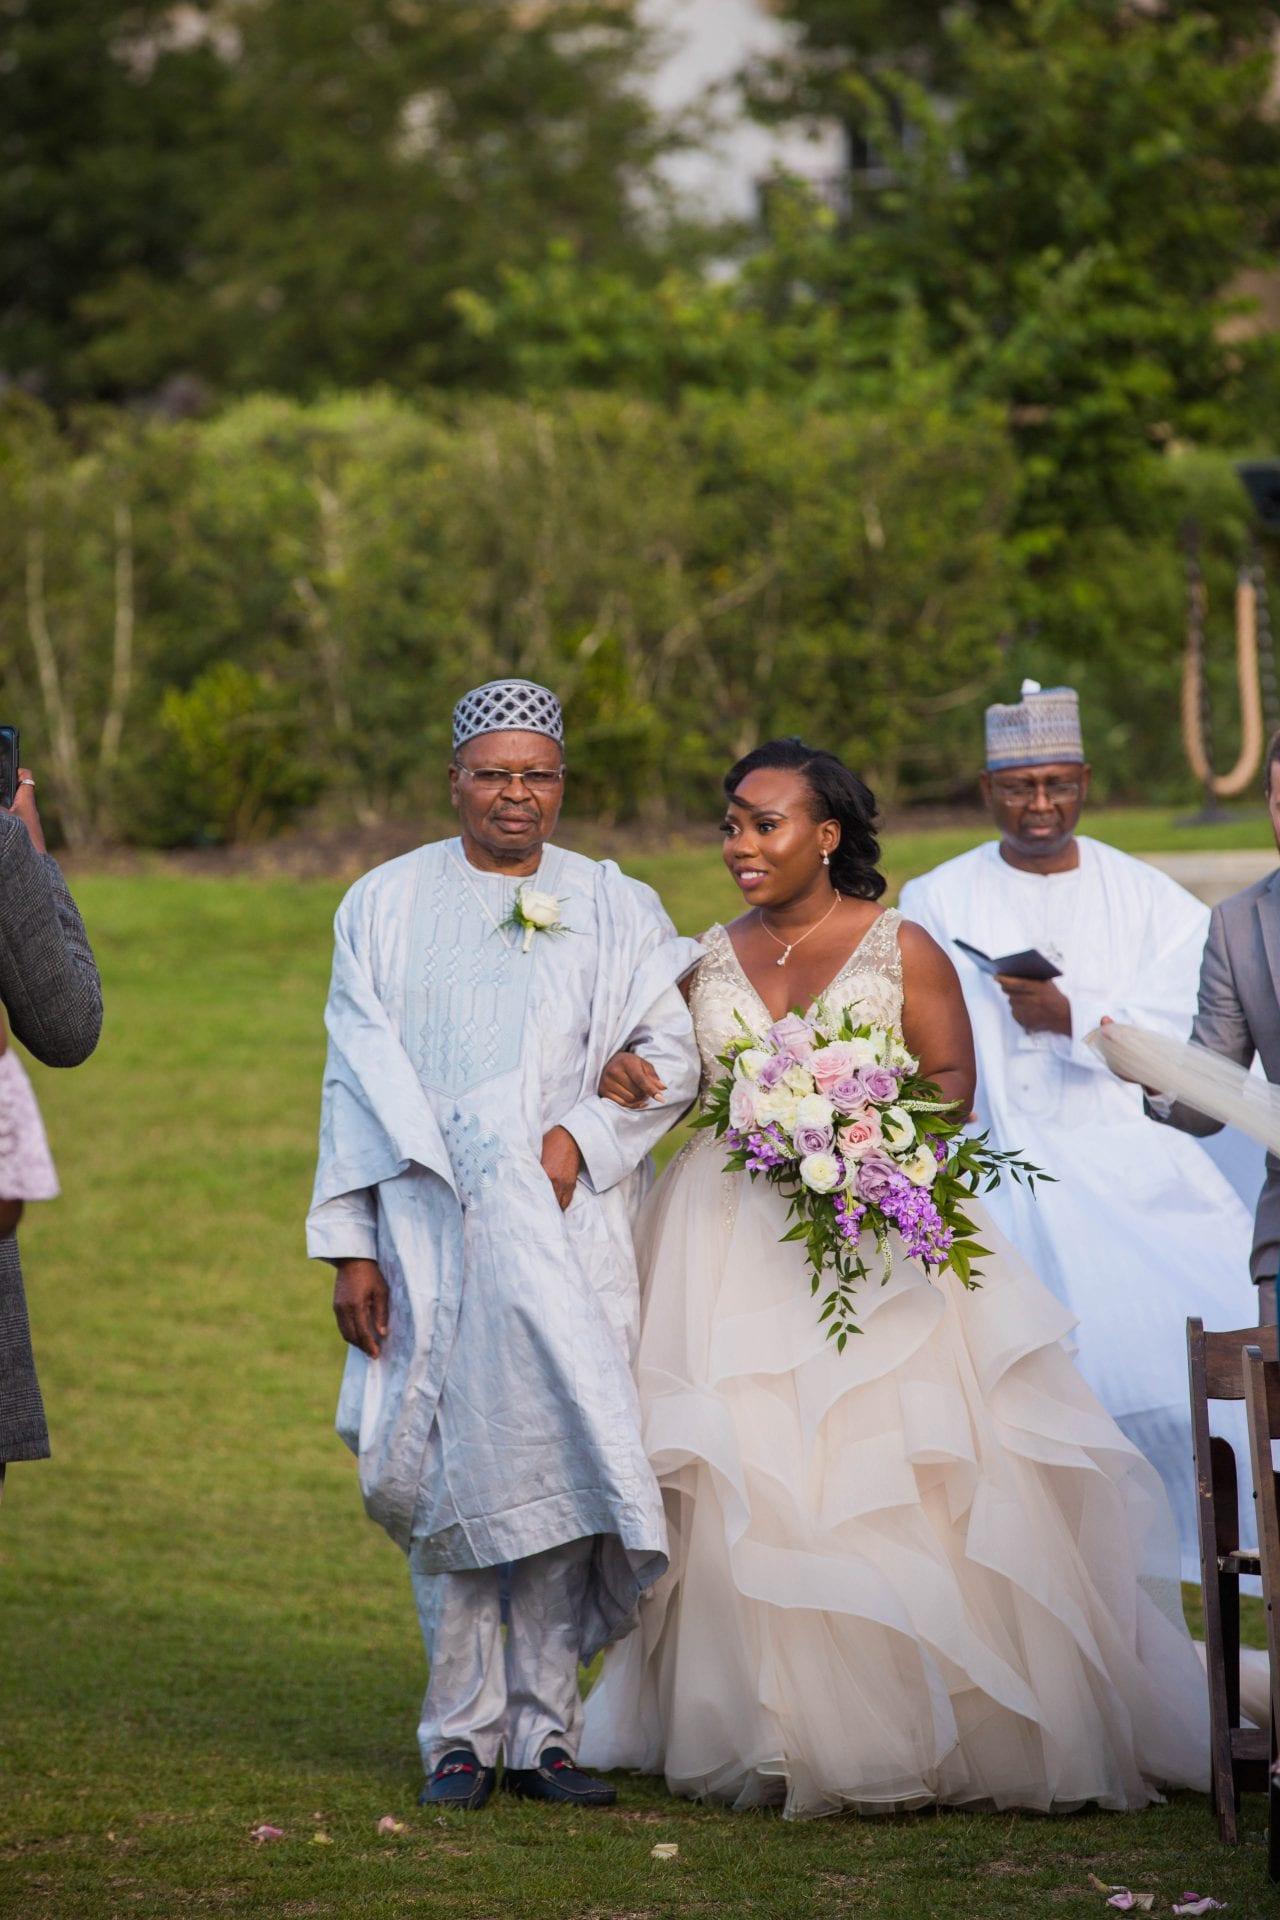 Onyema wedding La Cantera the walk down the aisle